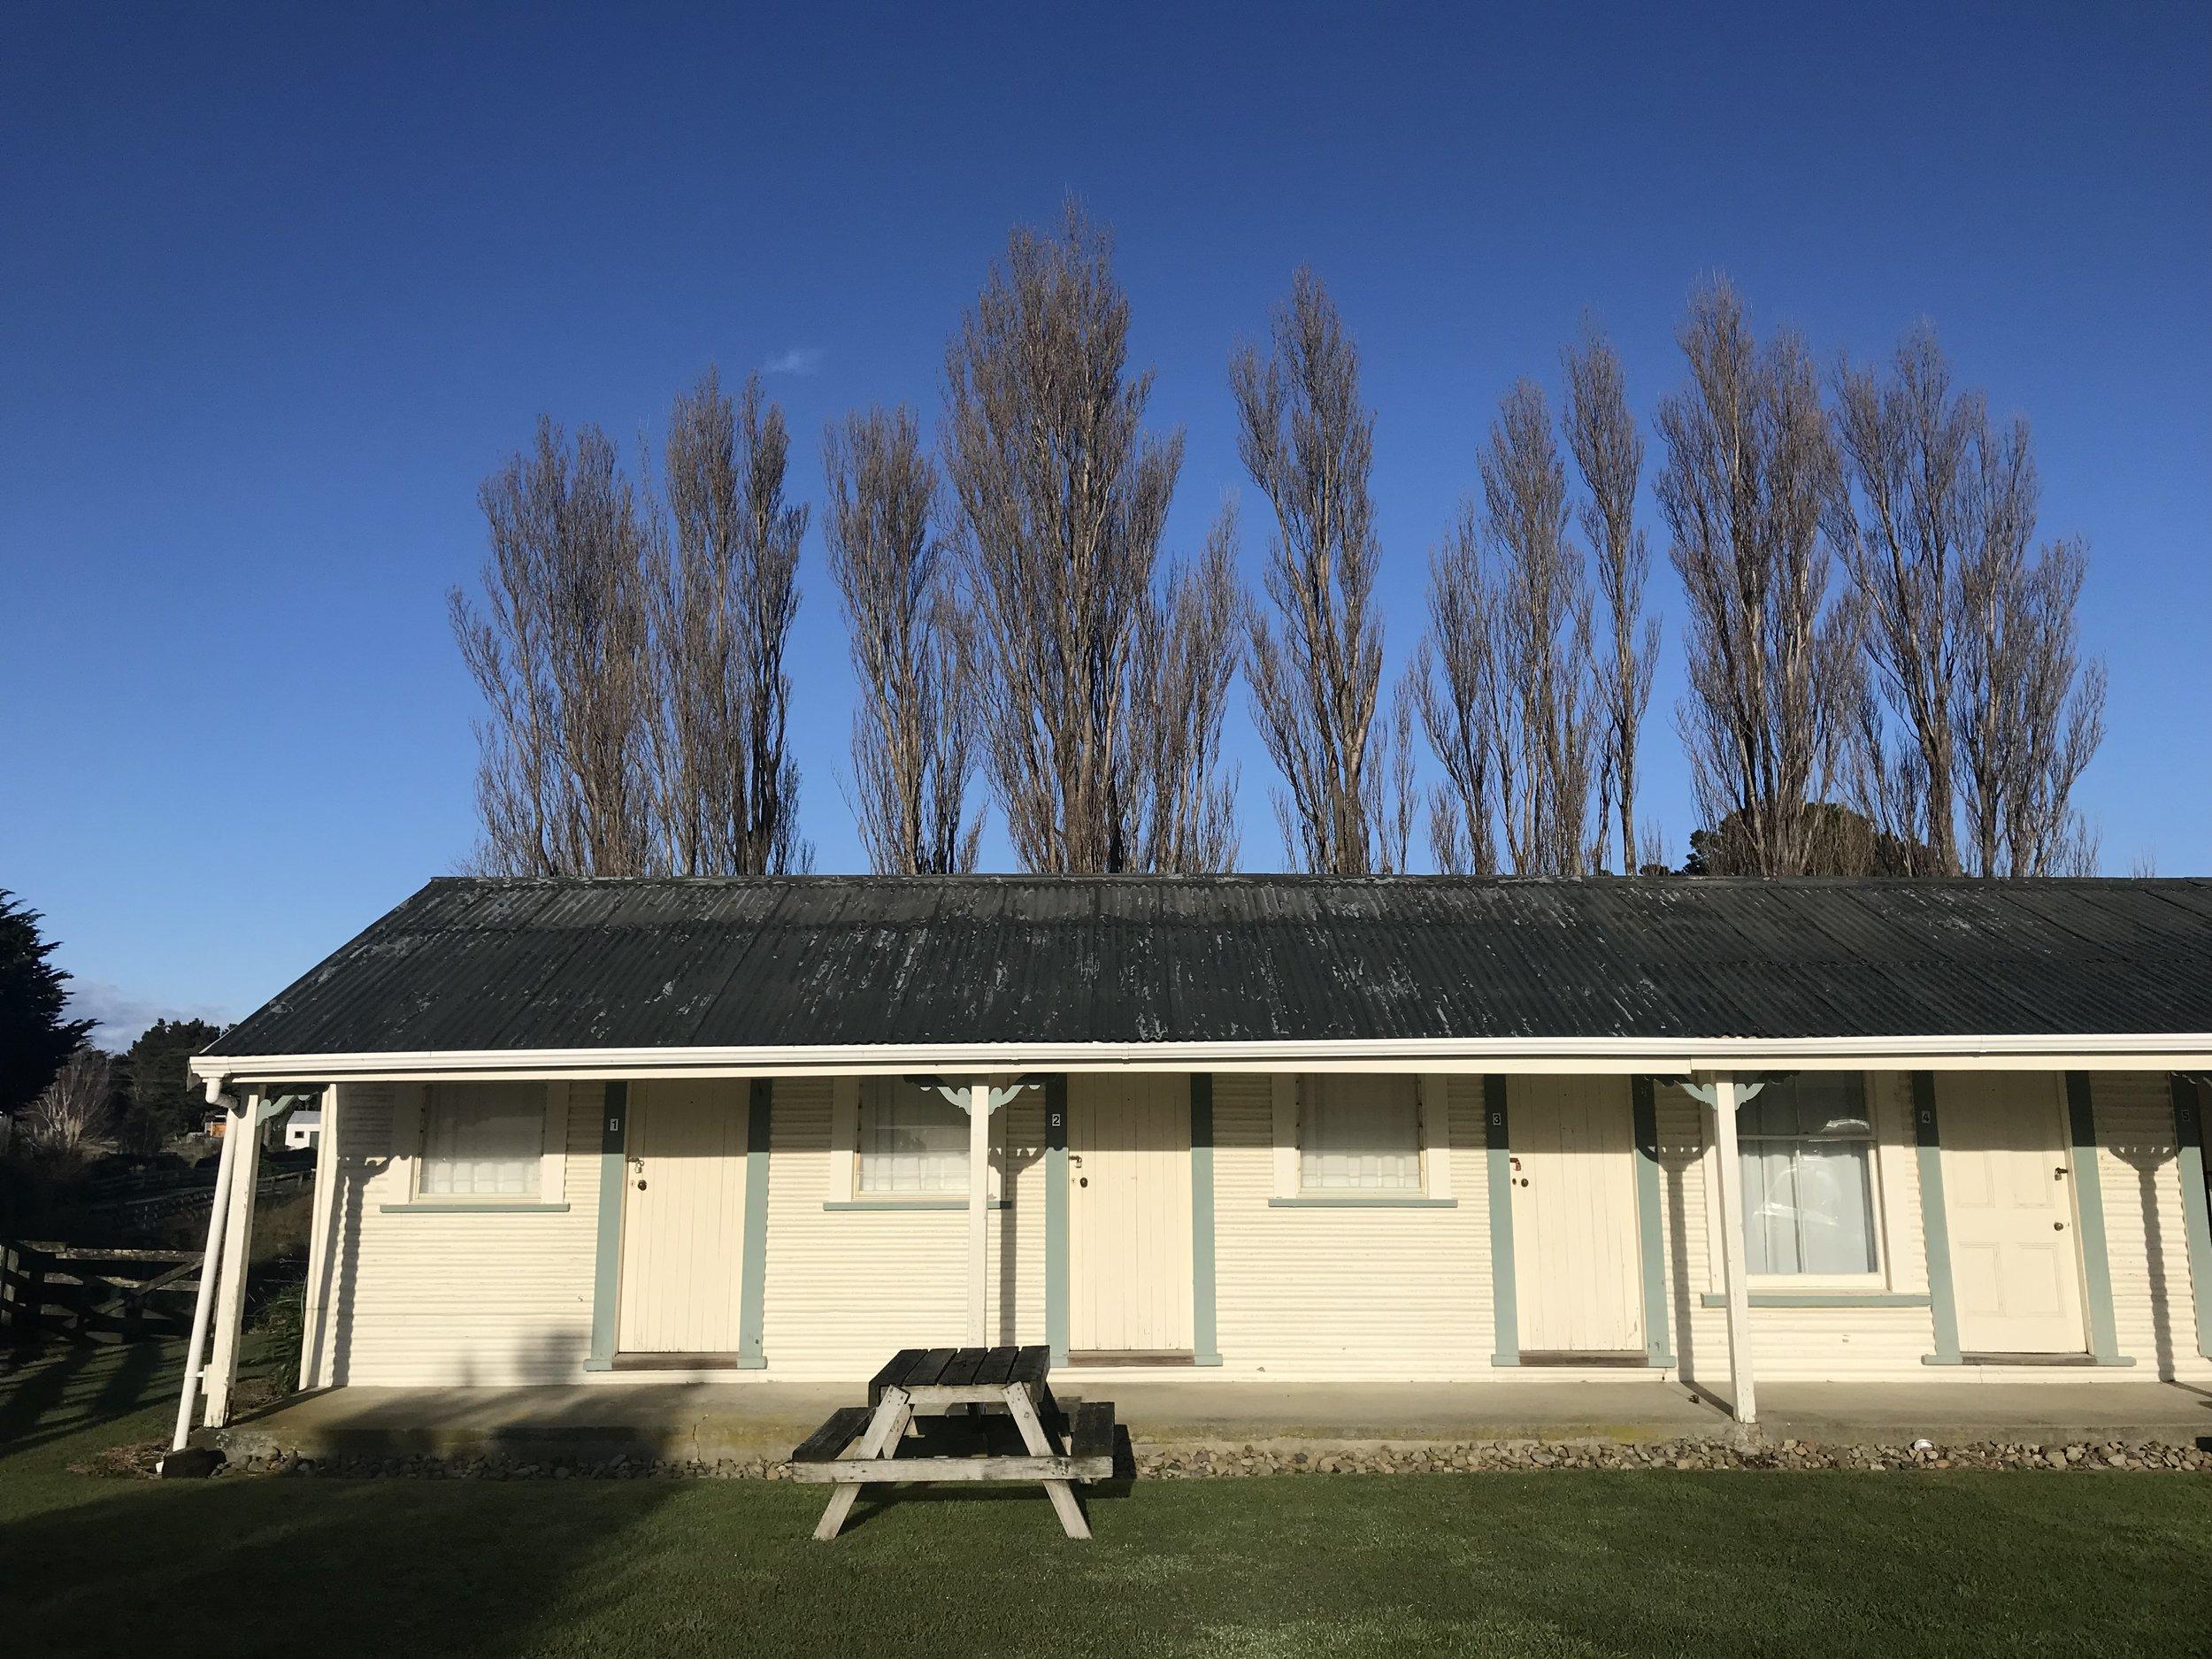 Original farmhouse of Orui Station, Wairarapa (image by Jacqui Gibson).